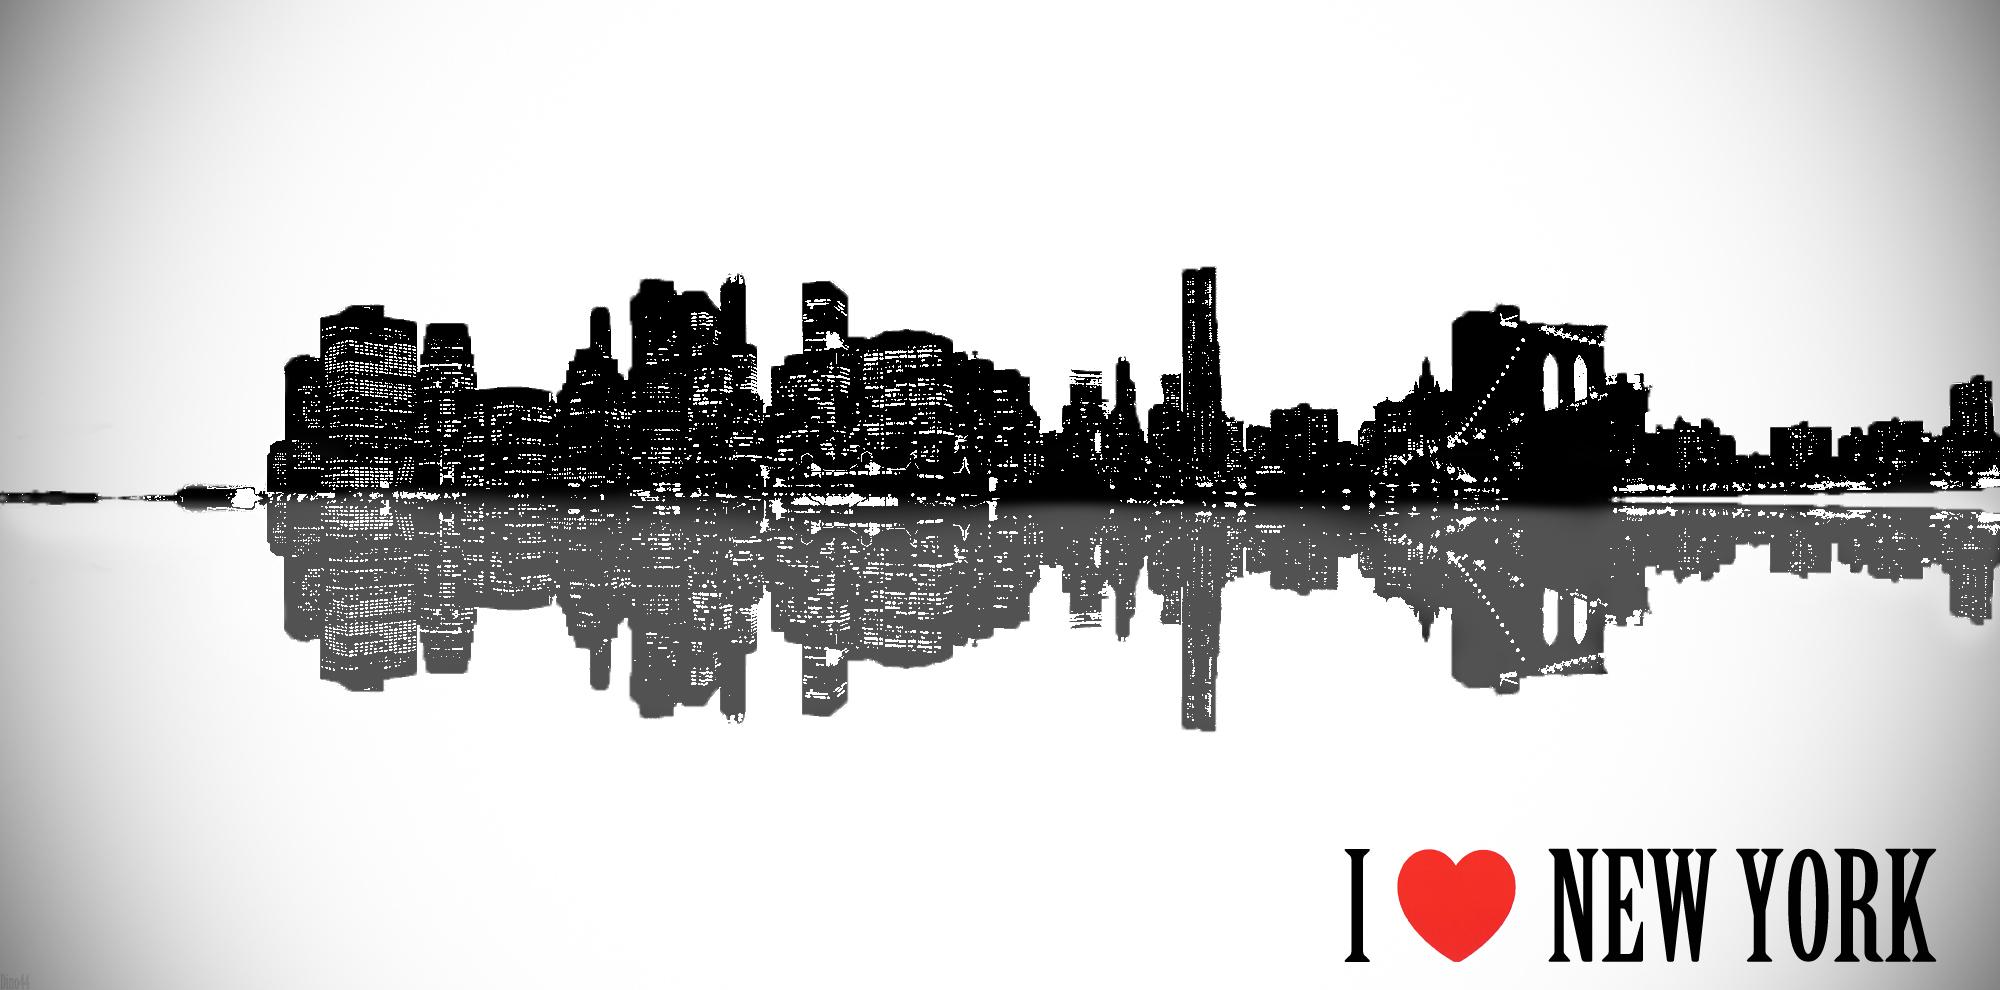 I love New York by Dino44